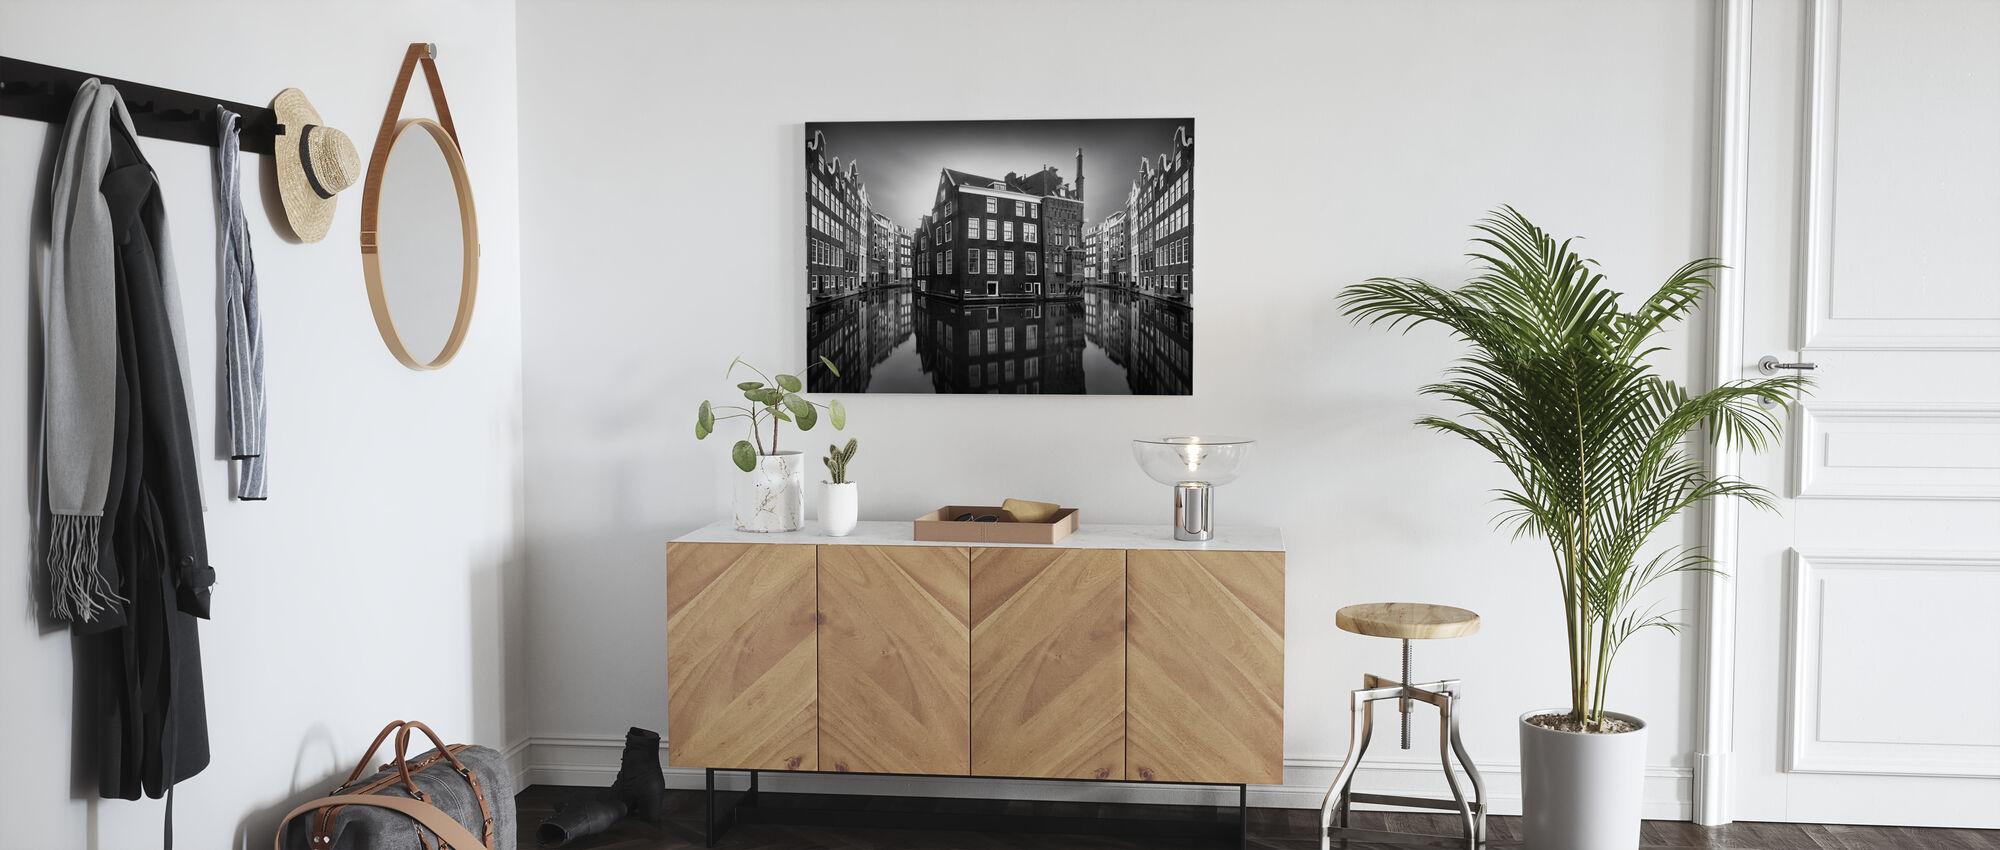 Amsterdam Canal Mirrors - Canvas print - Hallway